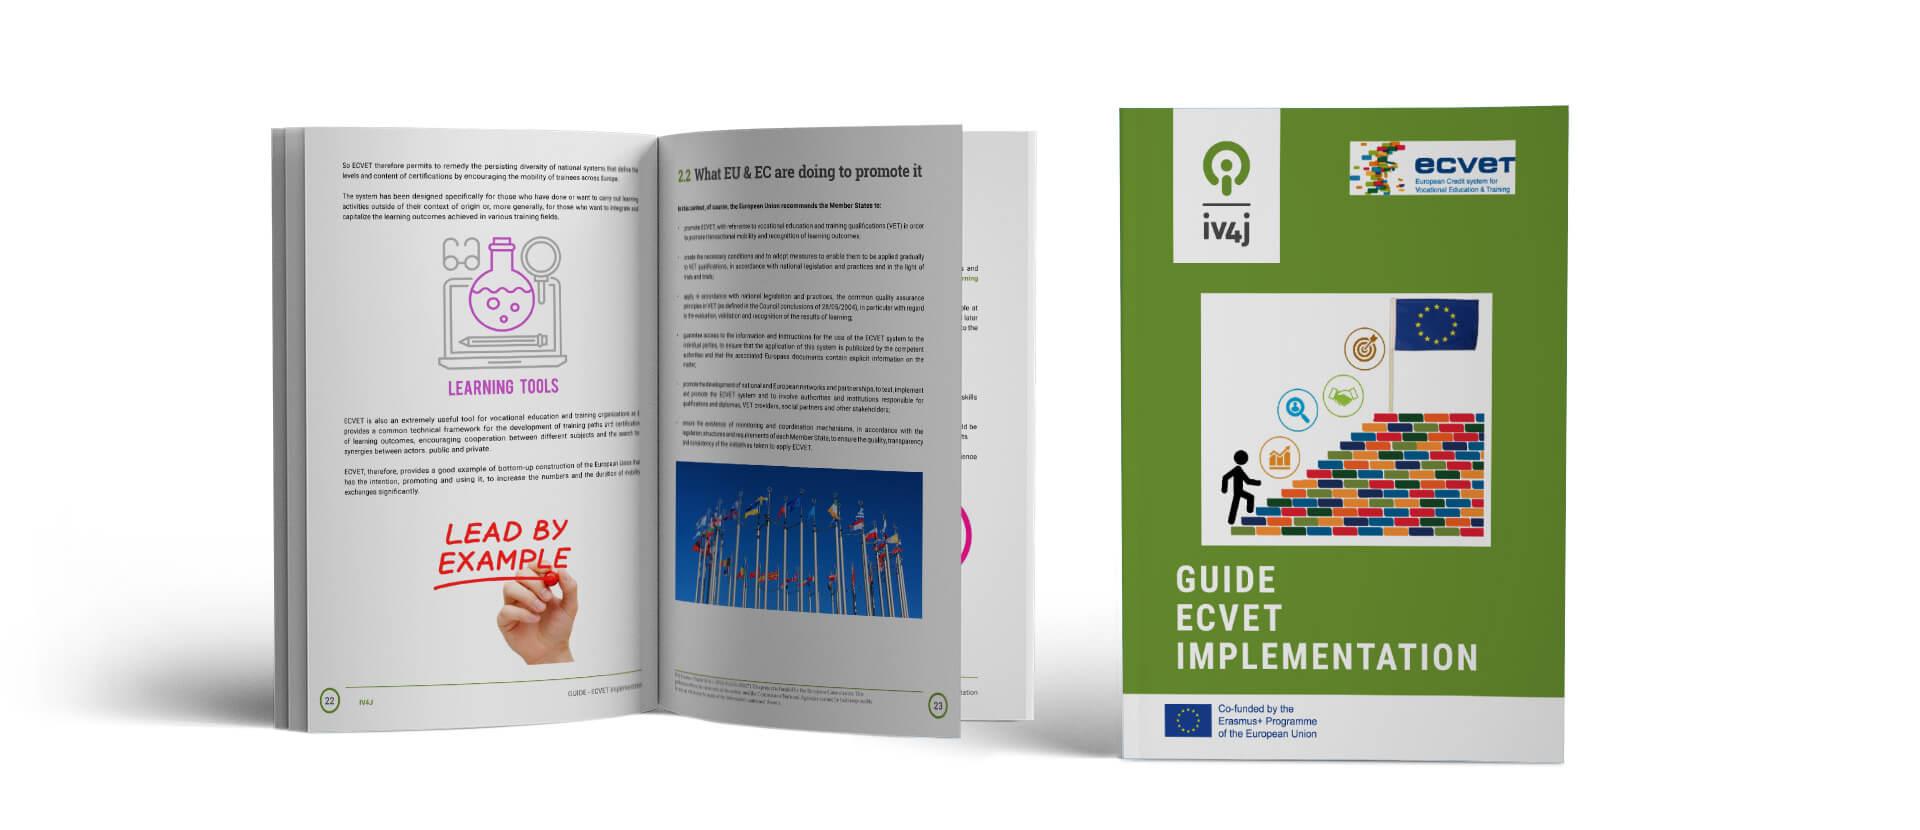 Guide to ECVET implementation